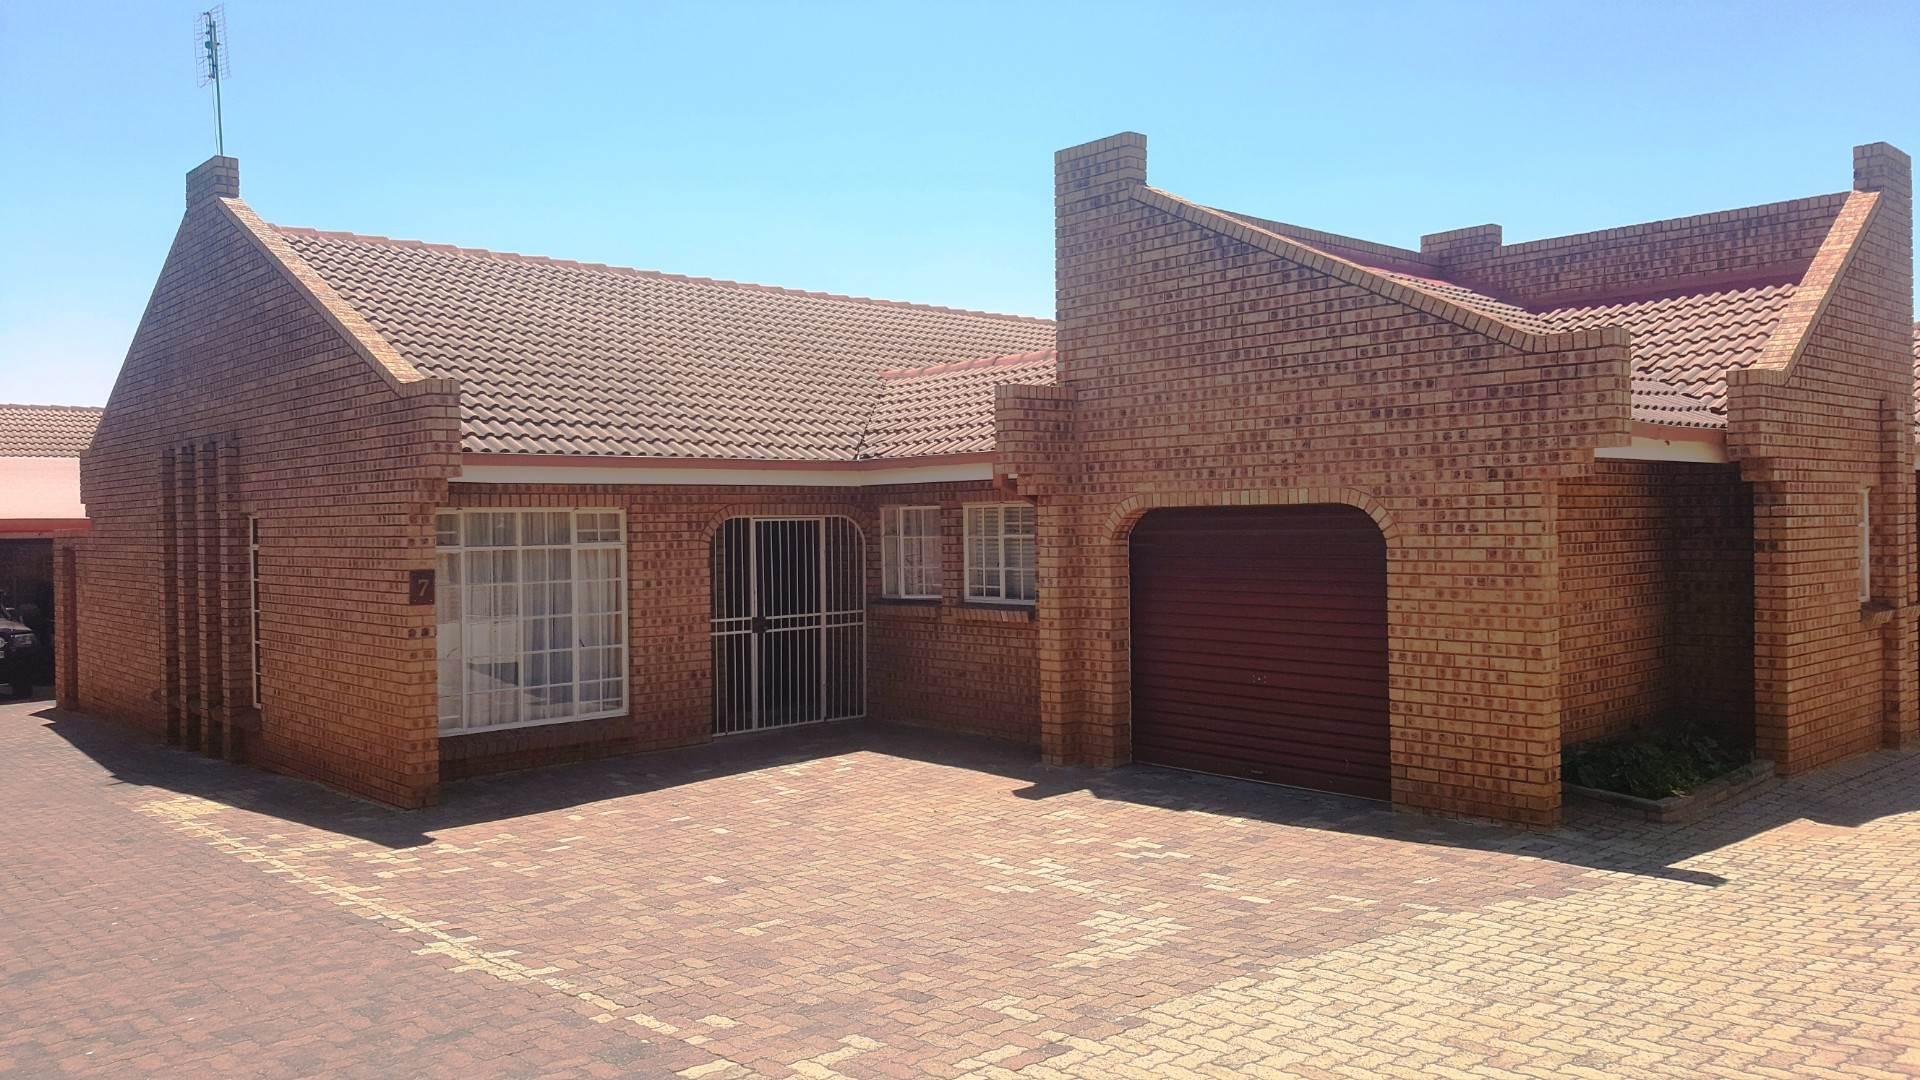 4 BedroomTownhouse For Sale In Middelburg Central